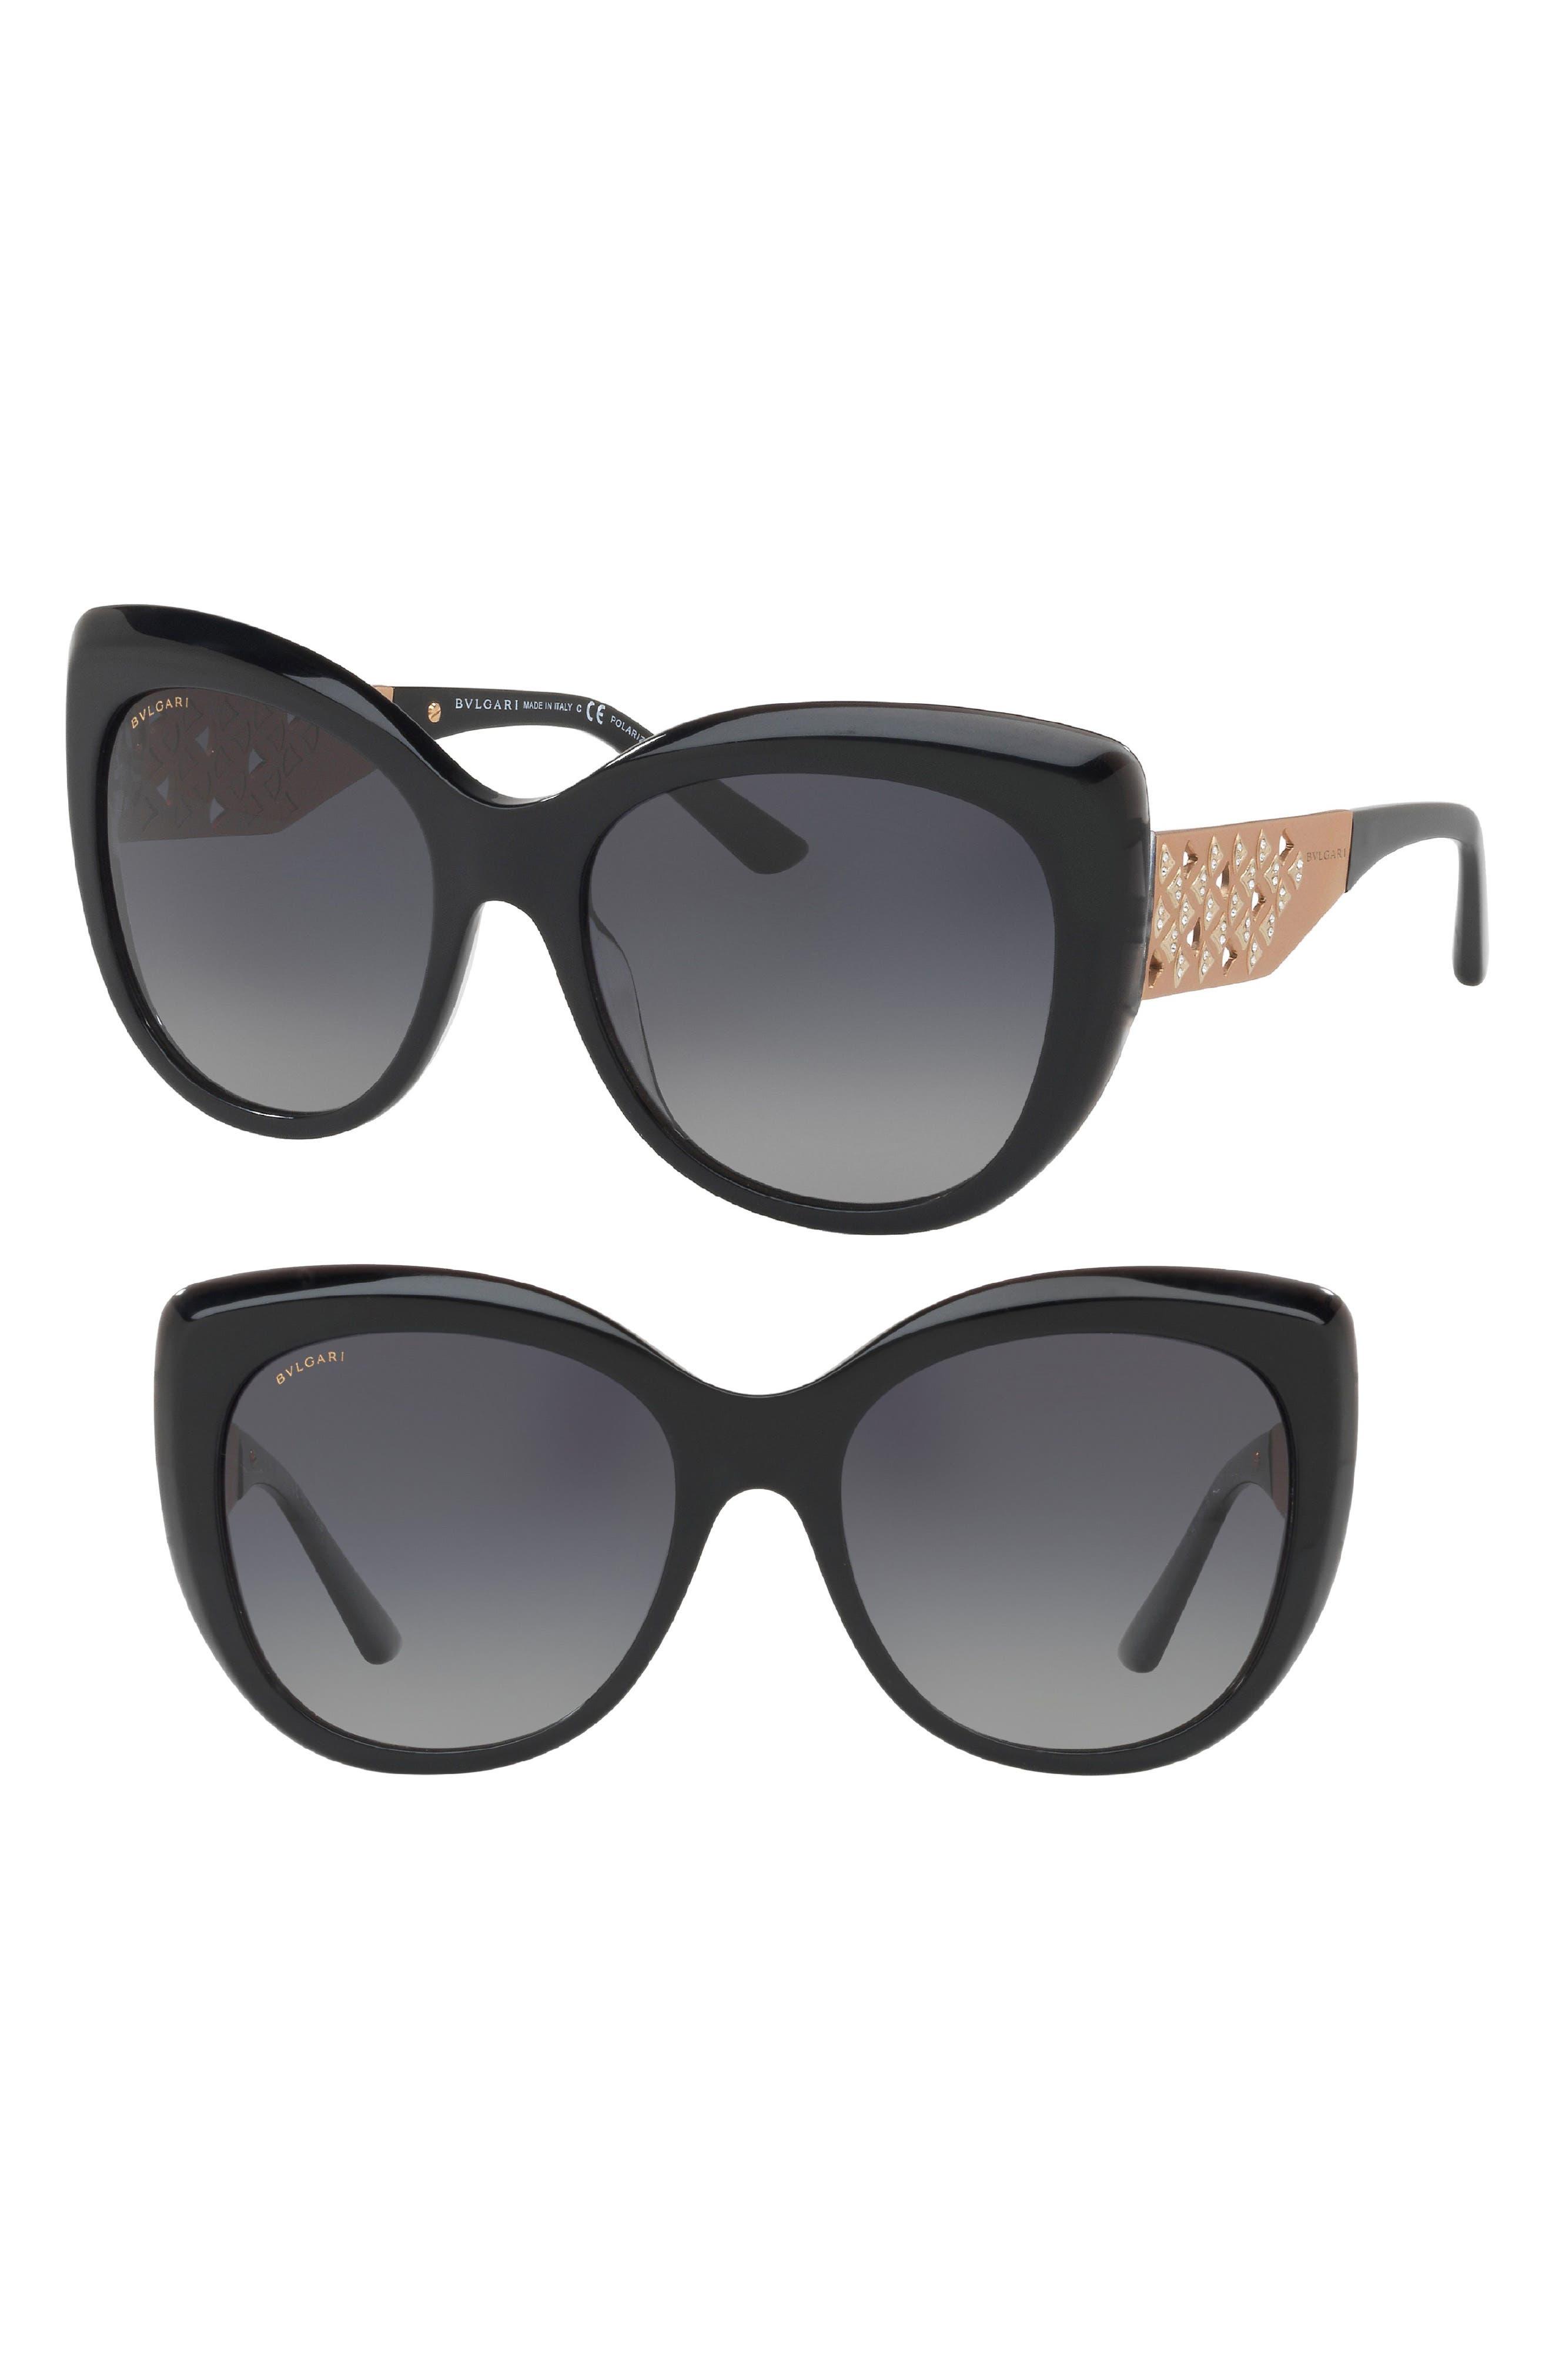 57mm Polarized Gradient Sunglasses,                             Main thumbnail 1, color,                             Black